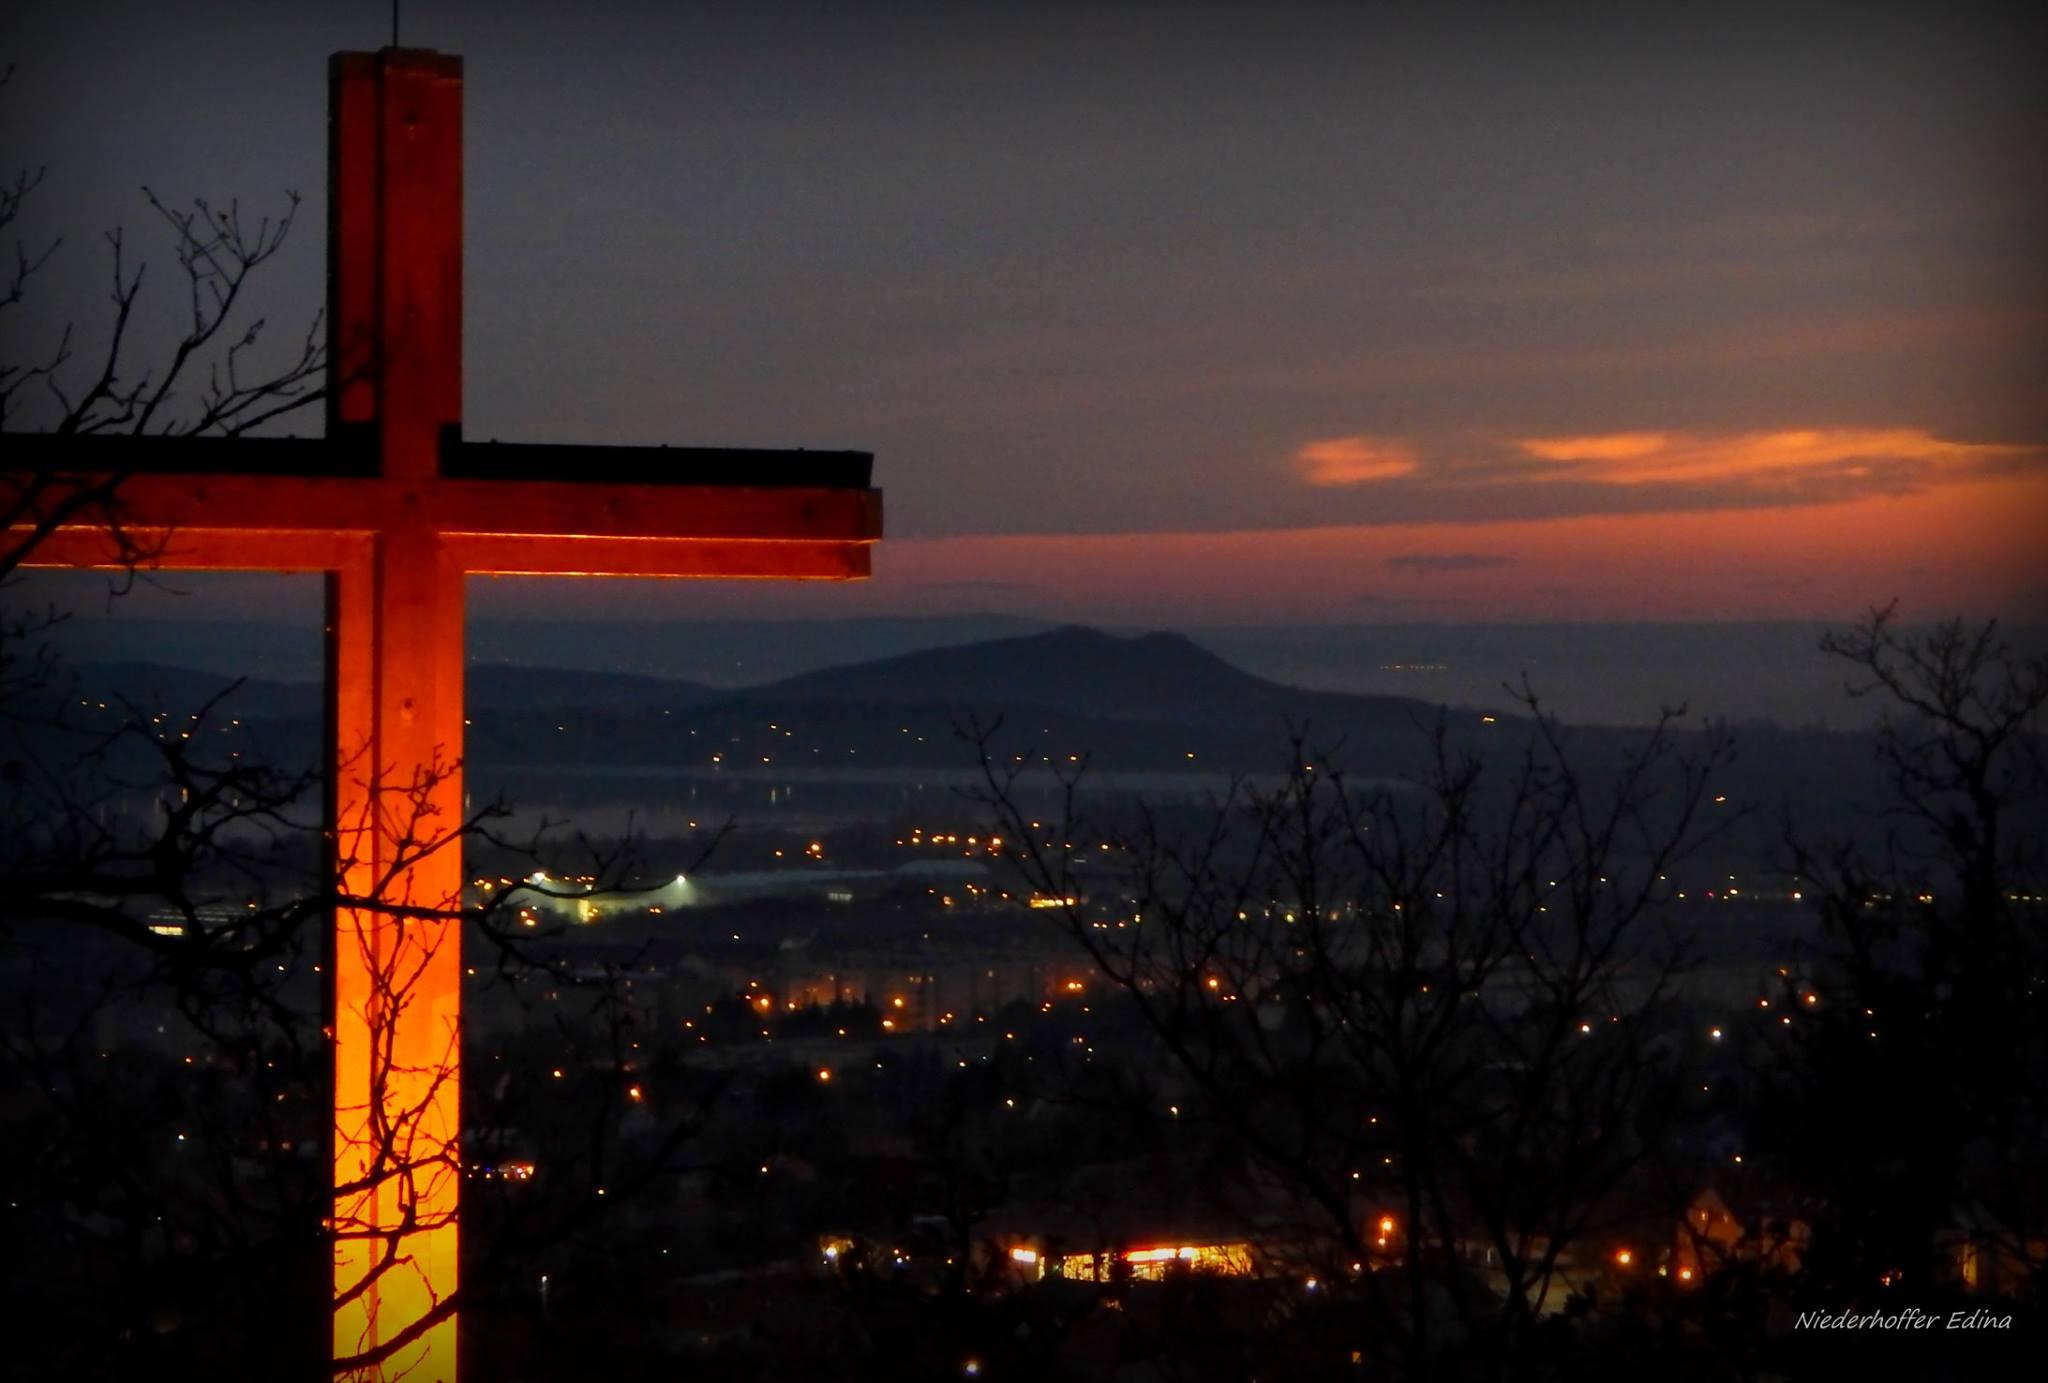 Jókai Look-out Tower, Tamáshegy, Balatonfüred.